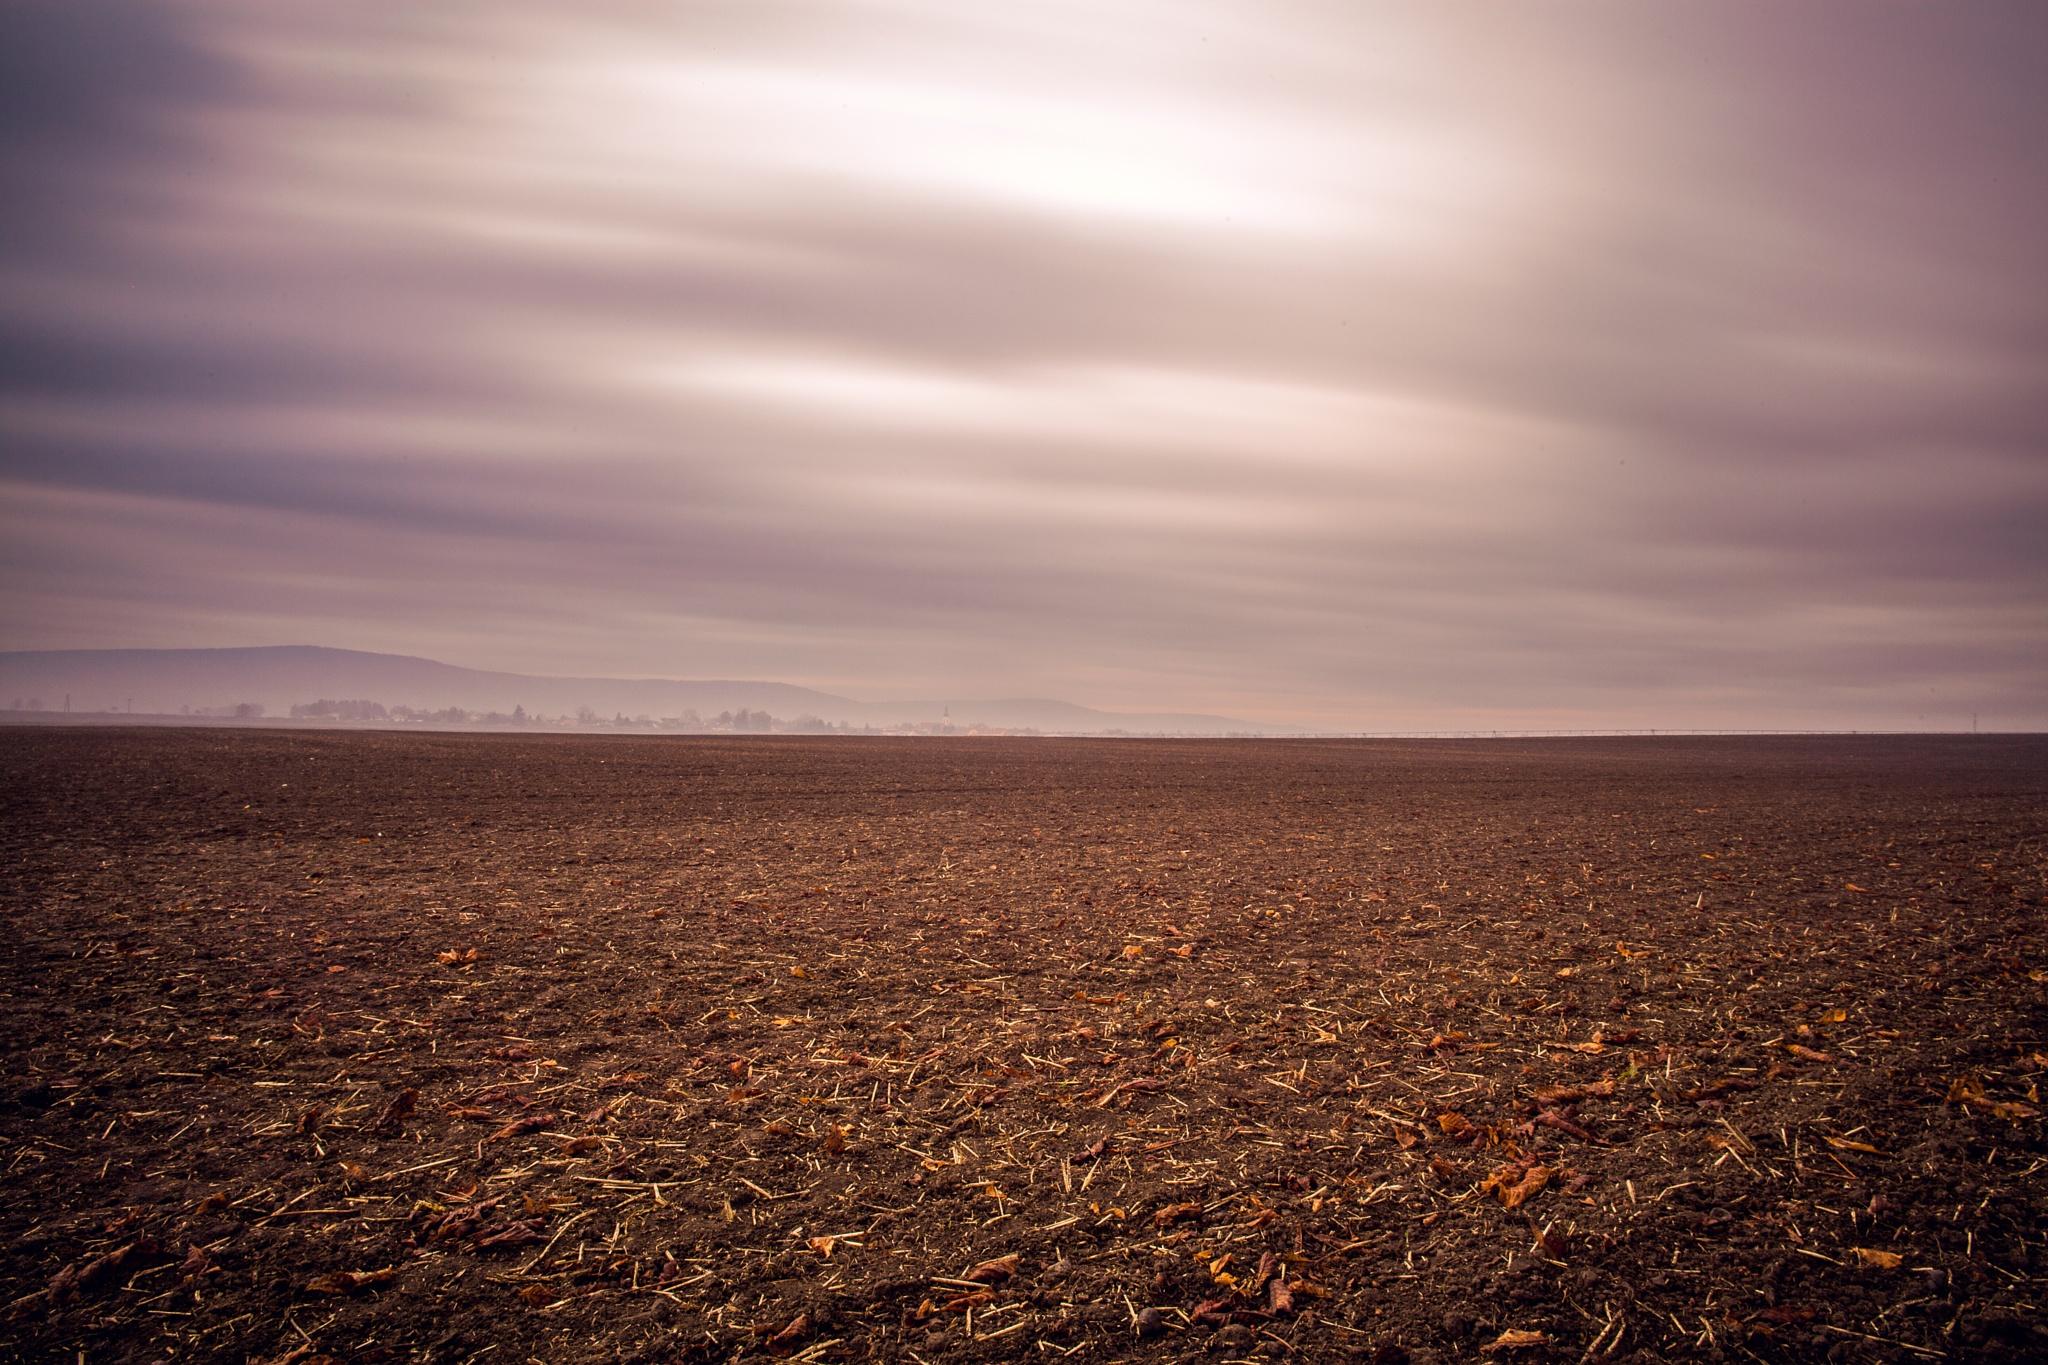 Sea of soil by Matej Kmet